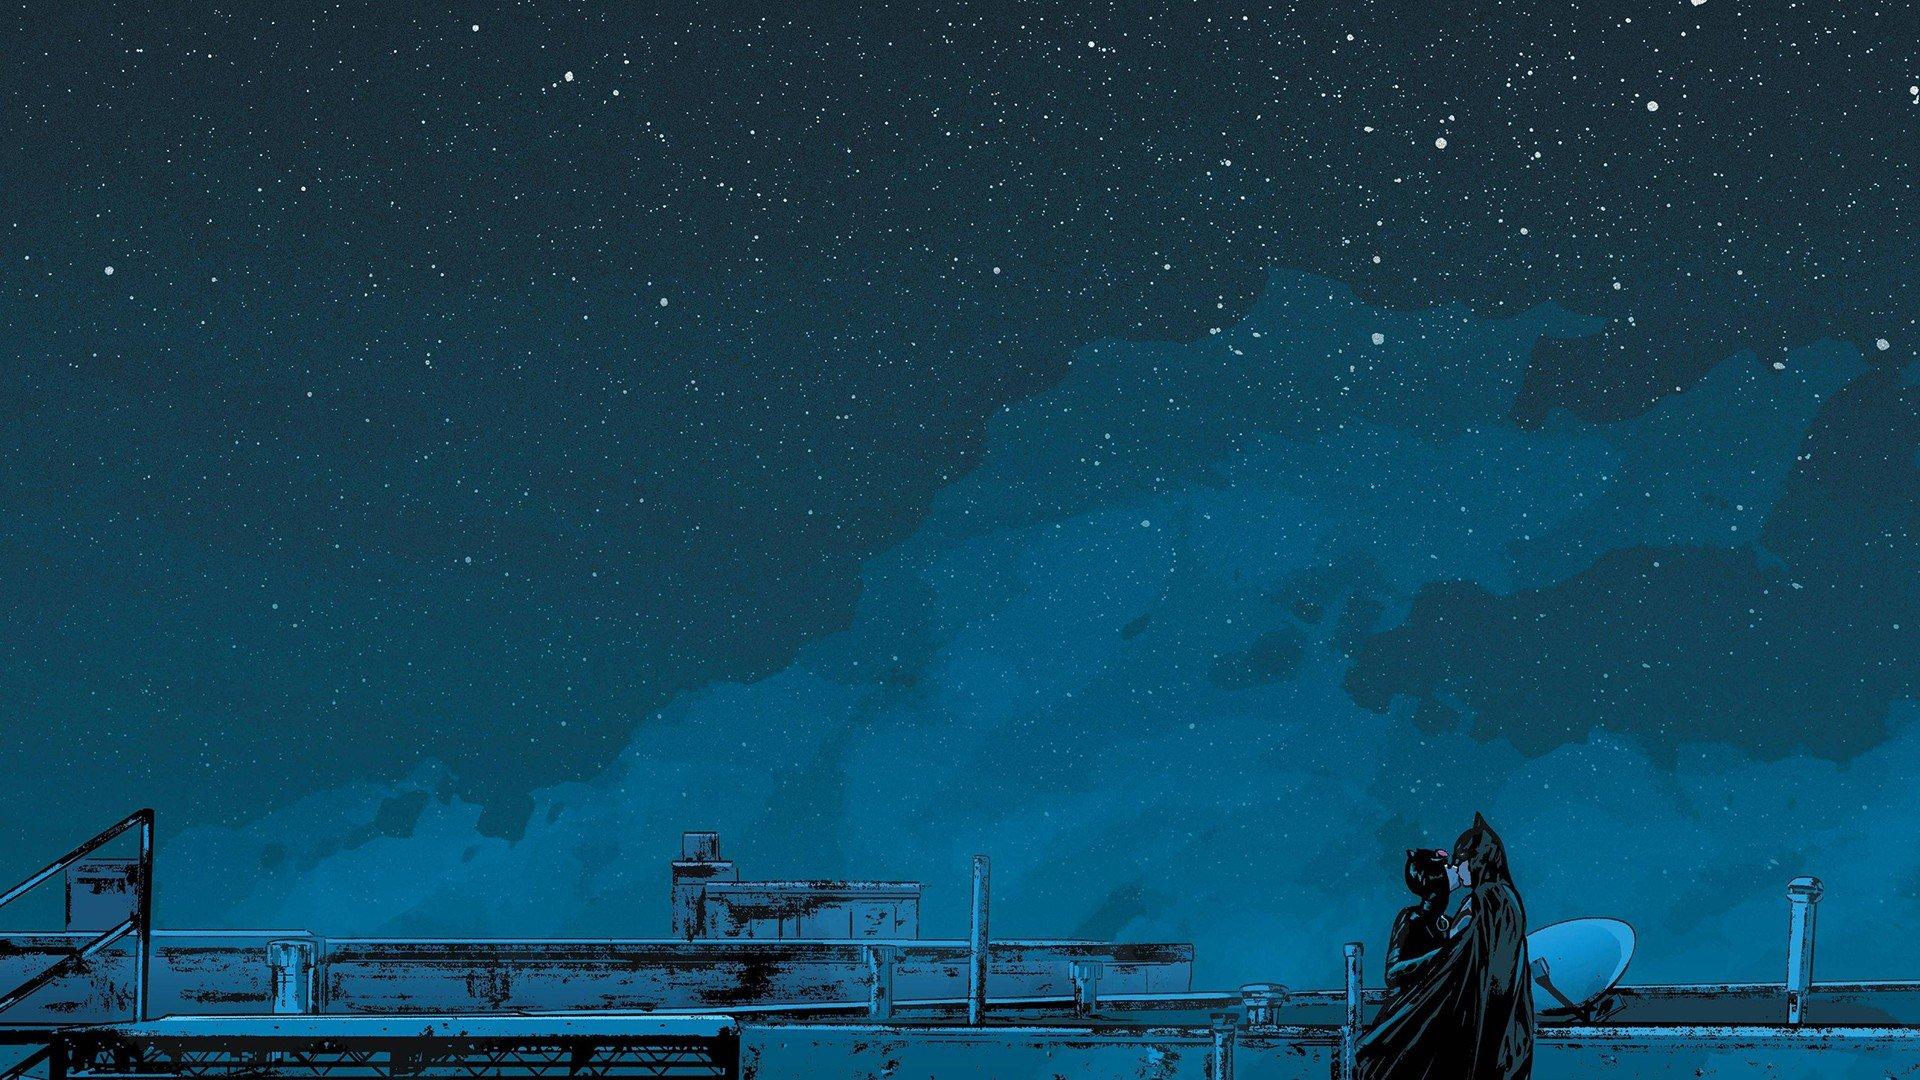 night sky batman catwoman starry night kissing hd wallpapers